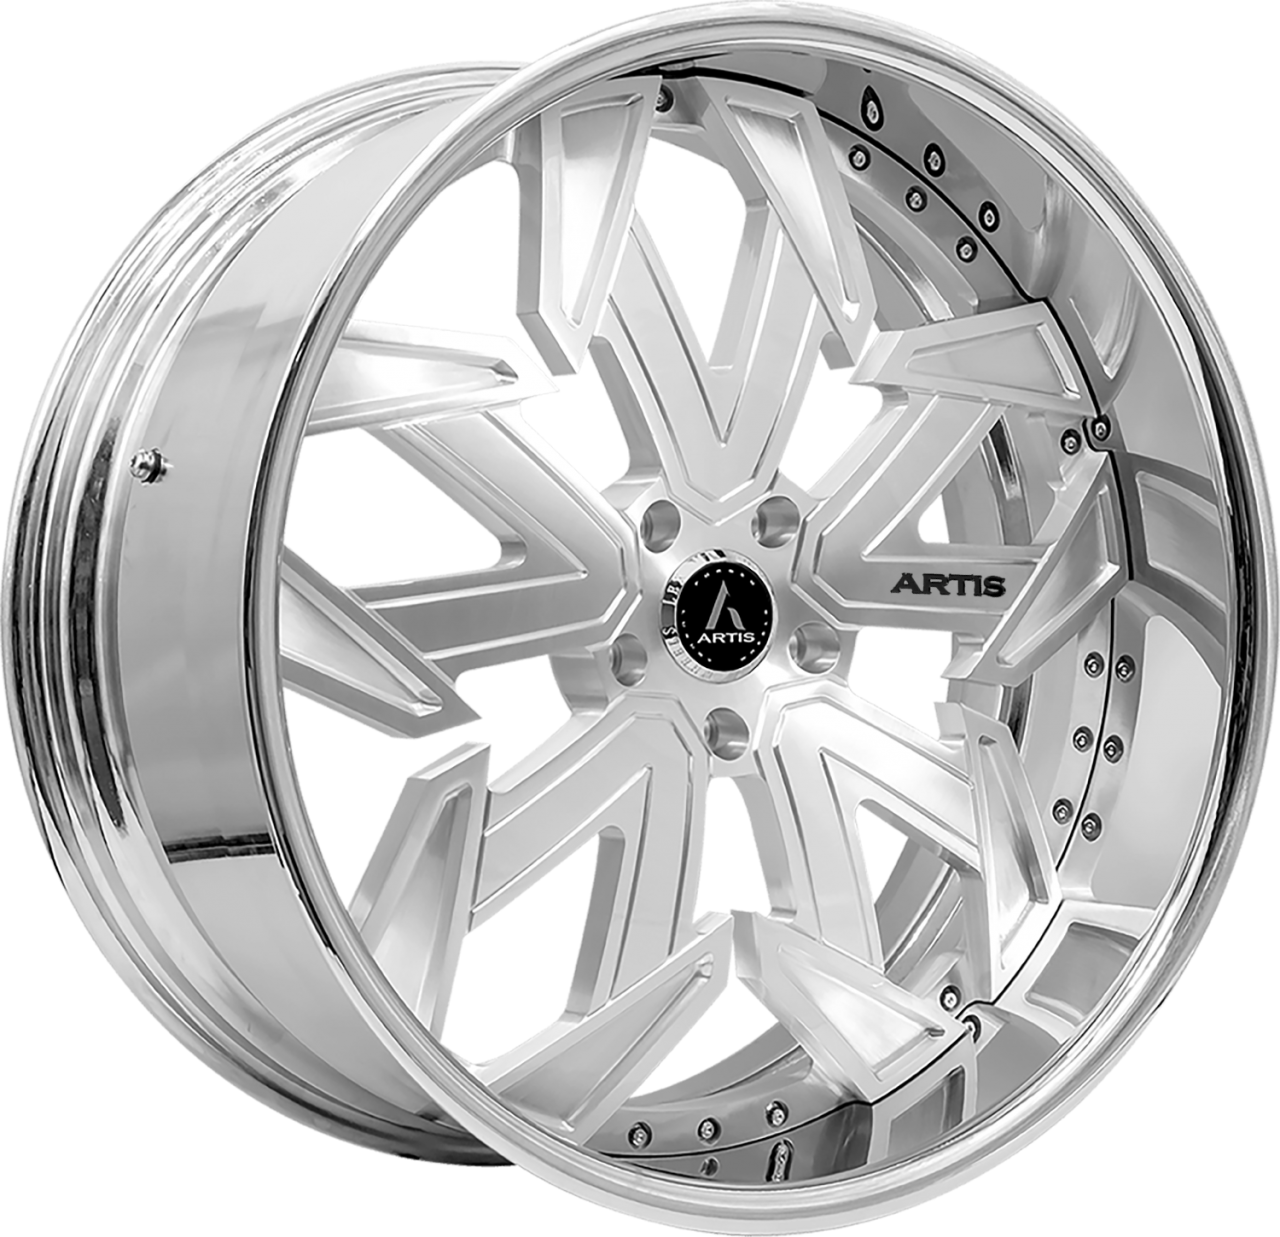 Artis Forged Lafayette wheel with Brushed finish